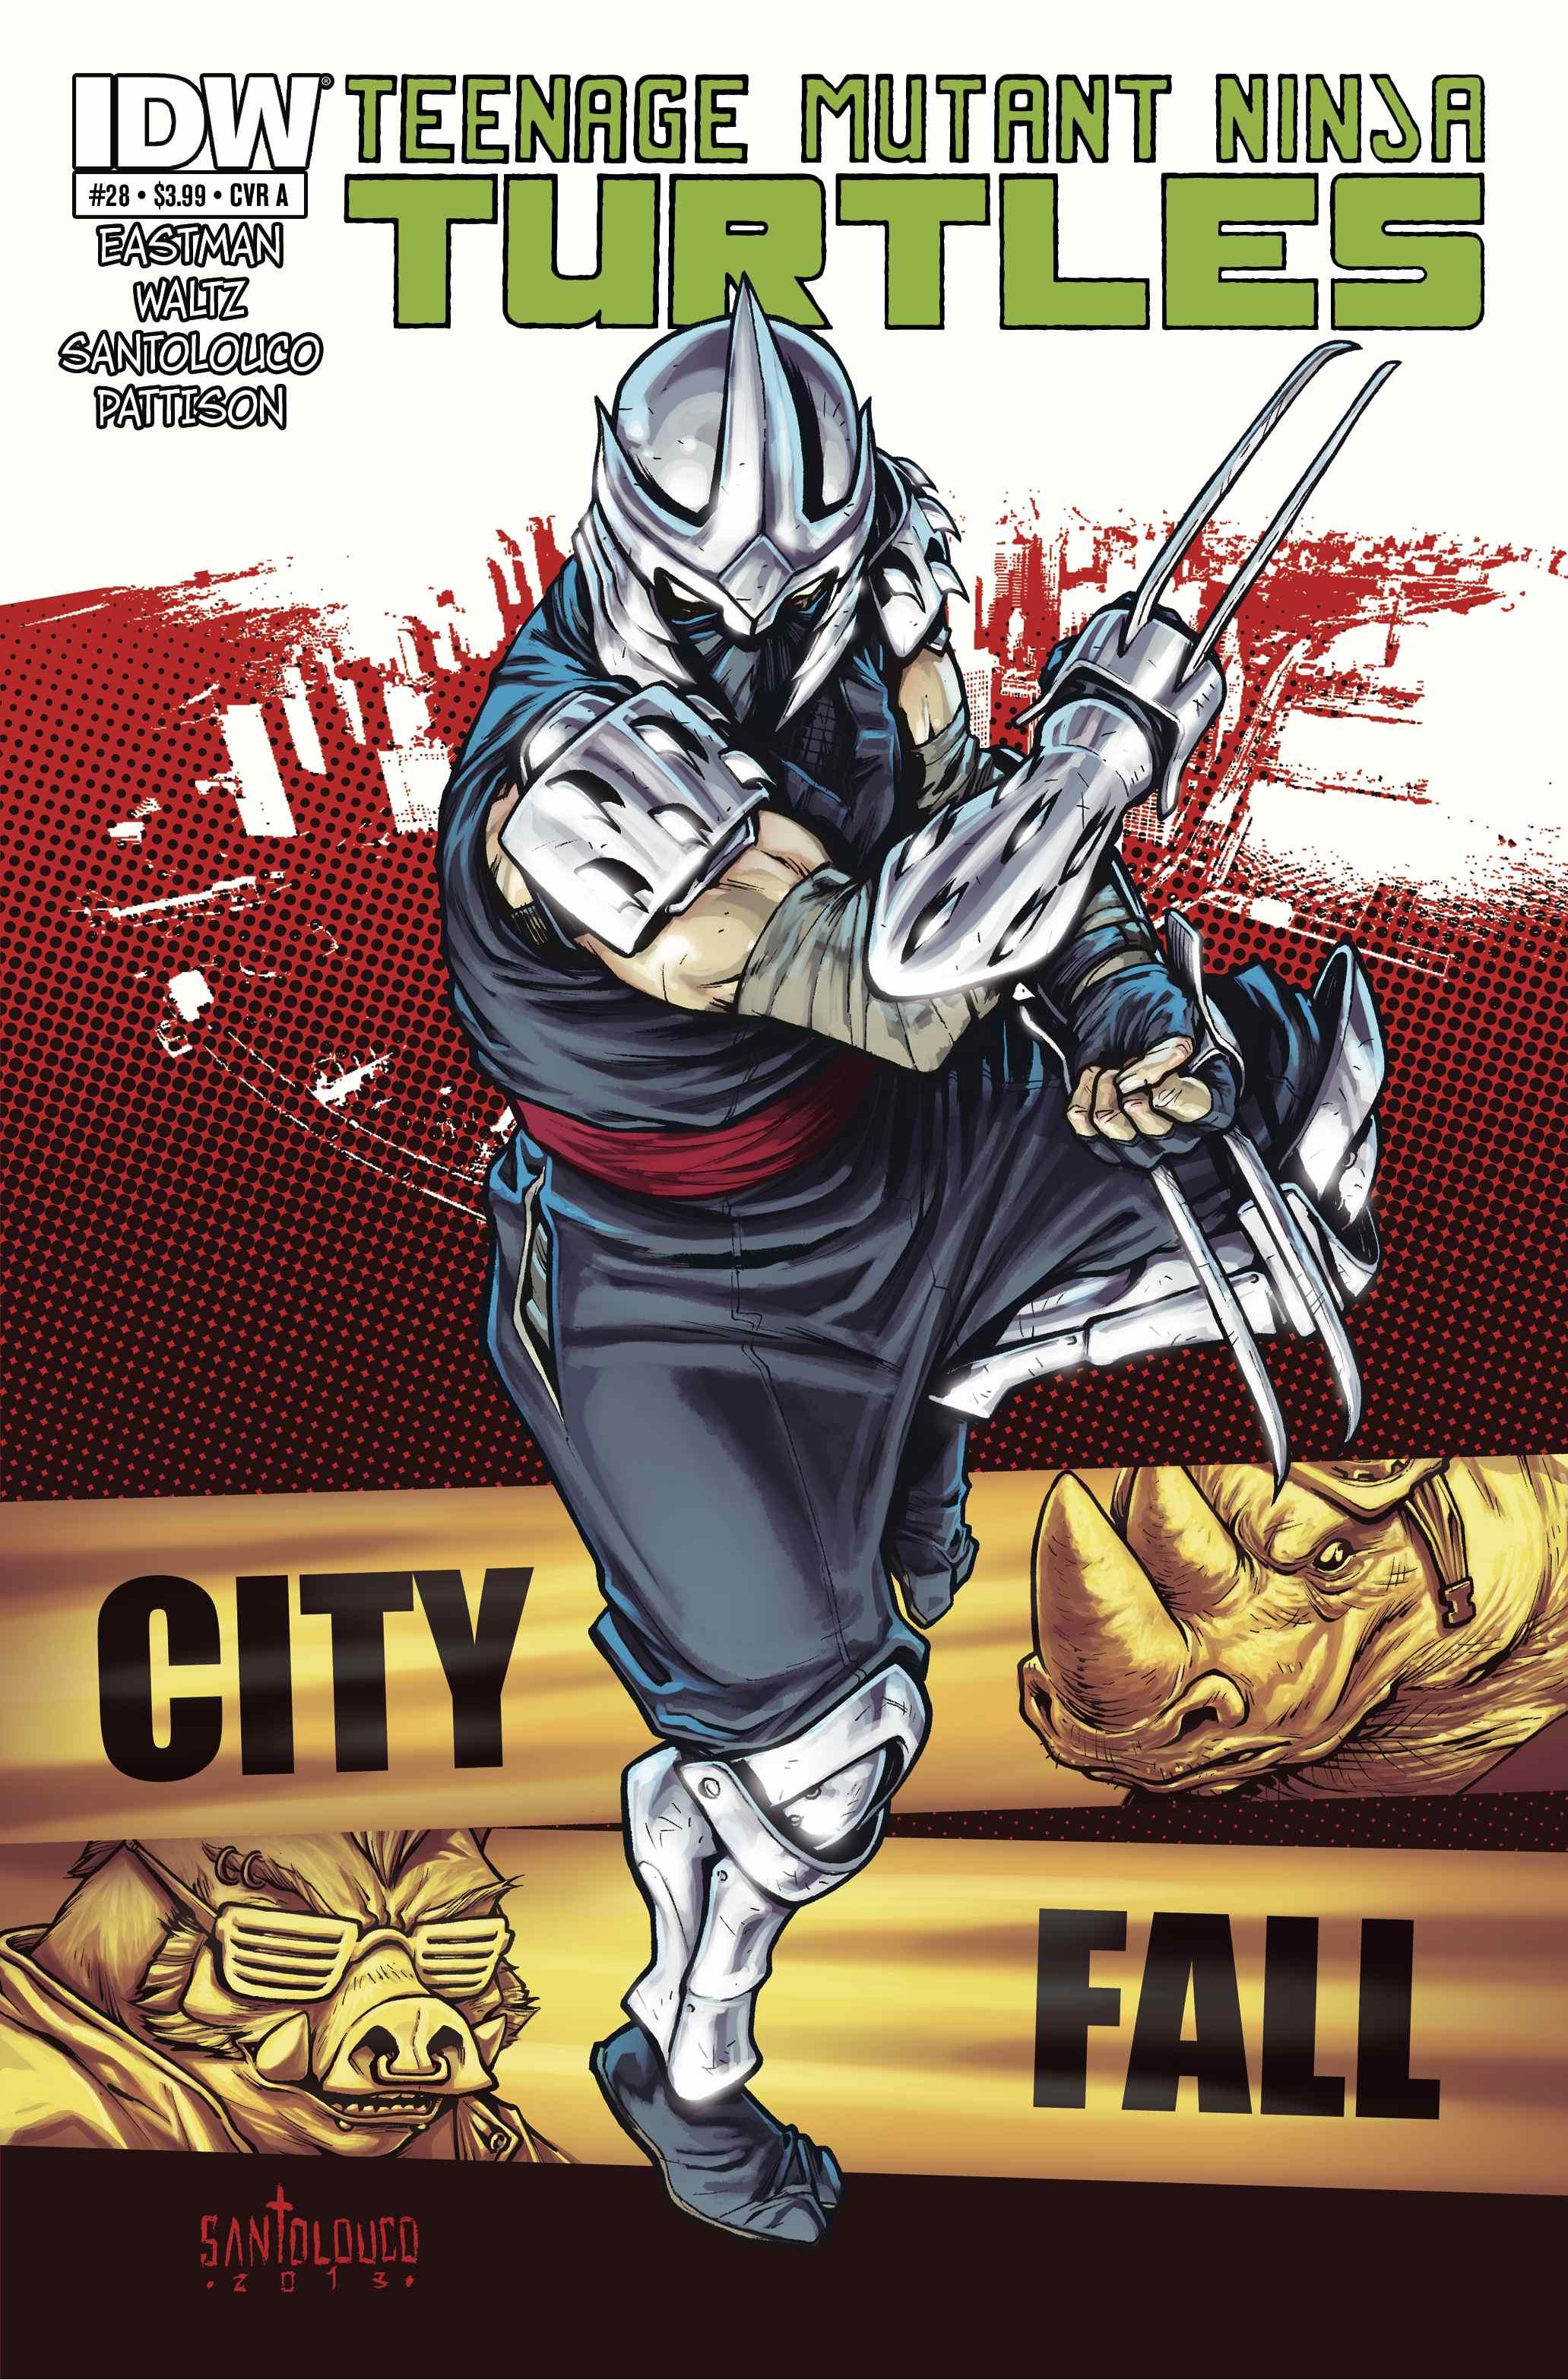 City Fall, part 7